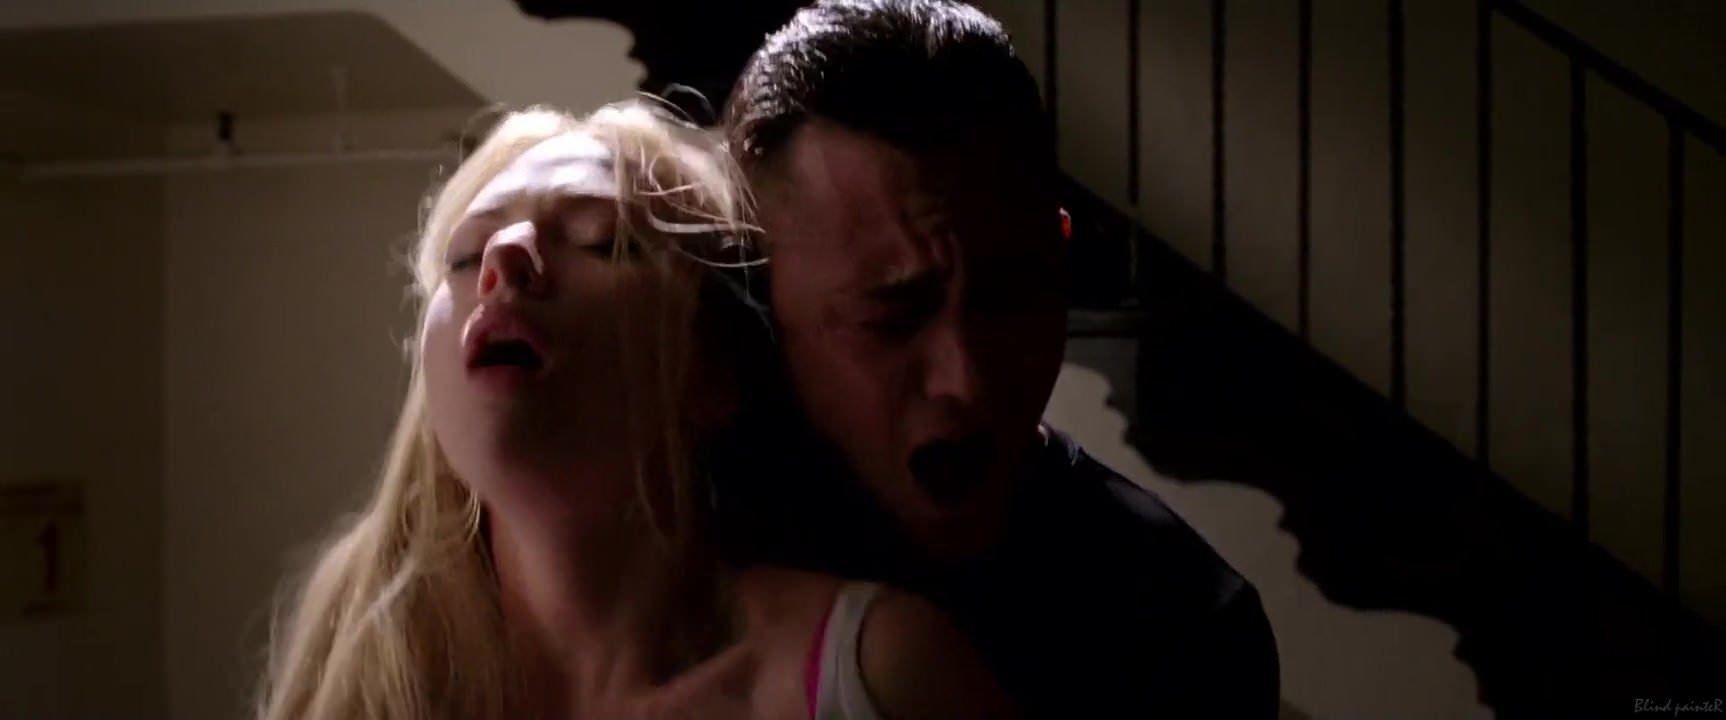 Scarlett johansson sex scene in don jon